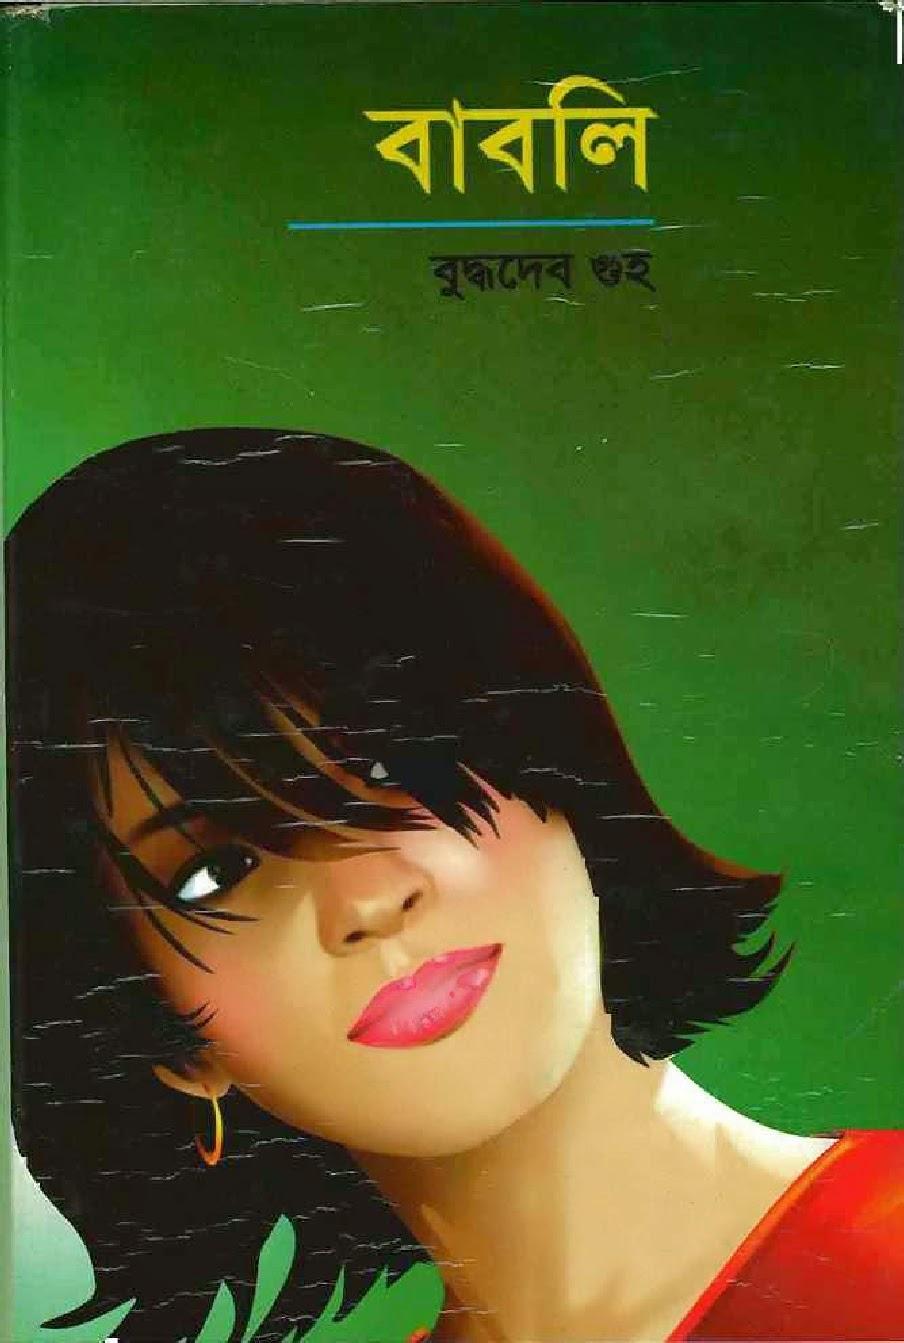 Babli by Buddhadeb Guha